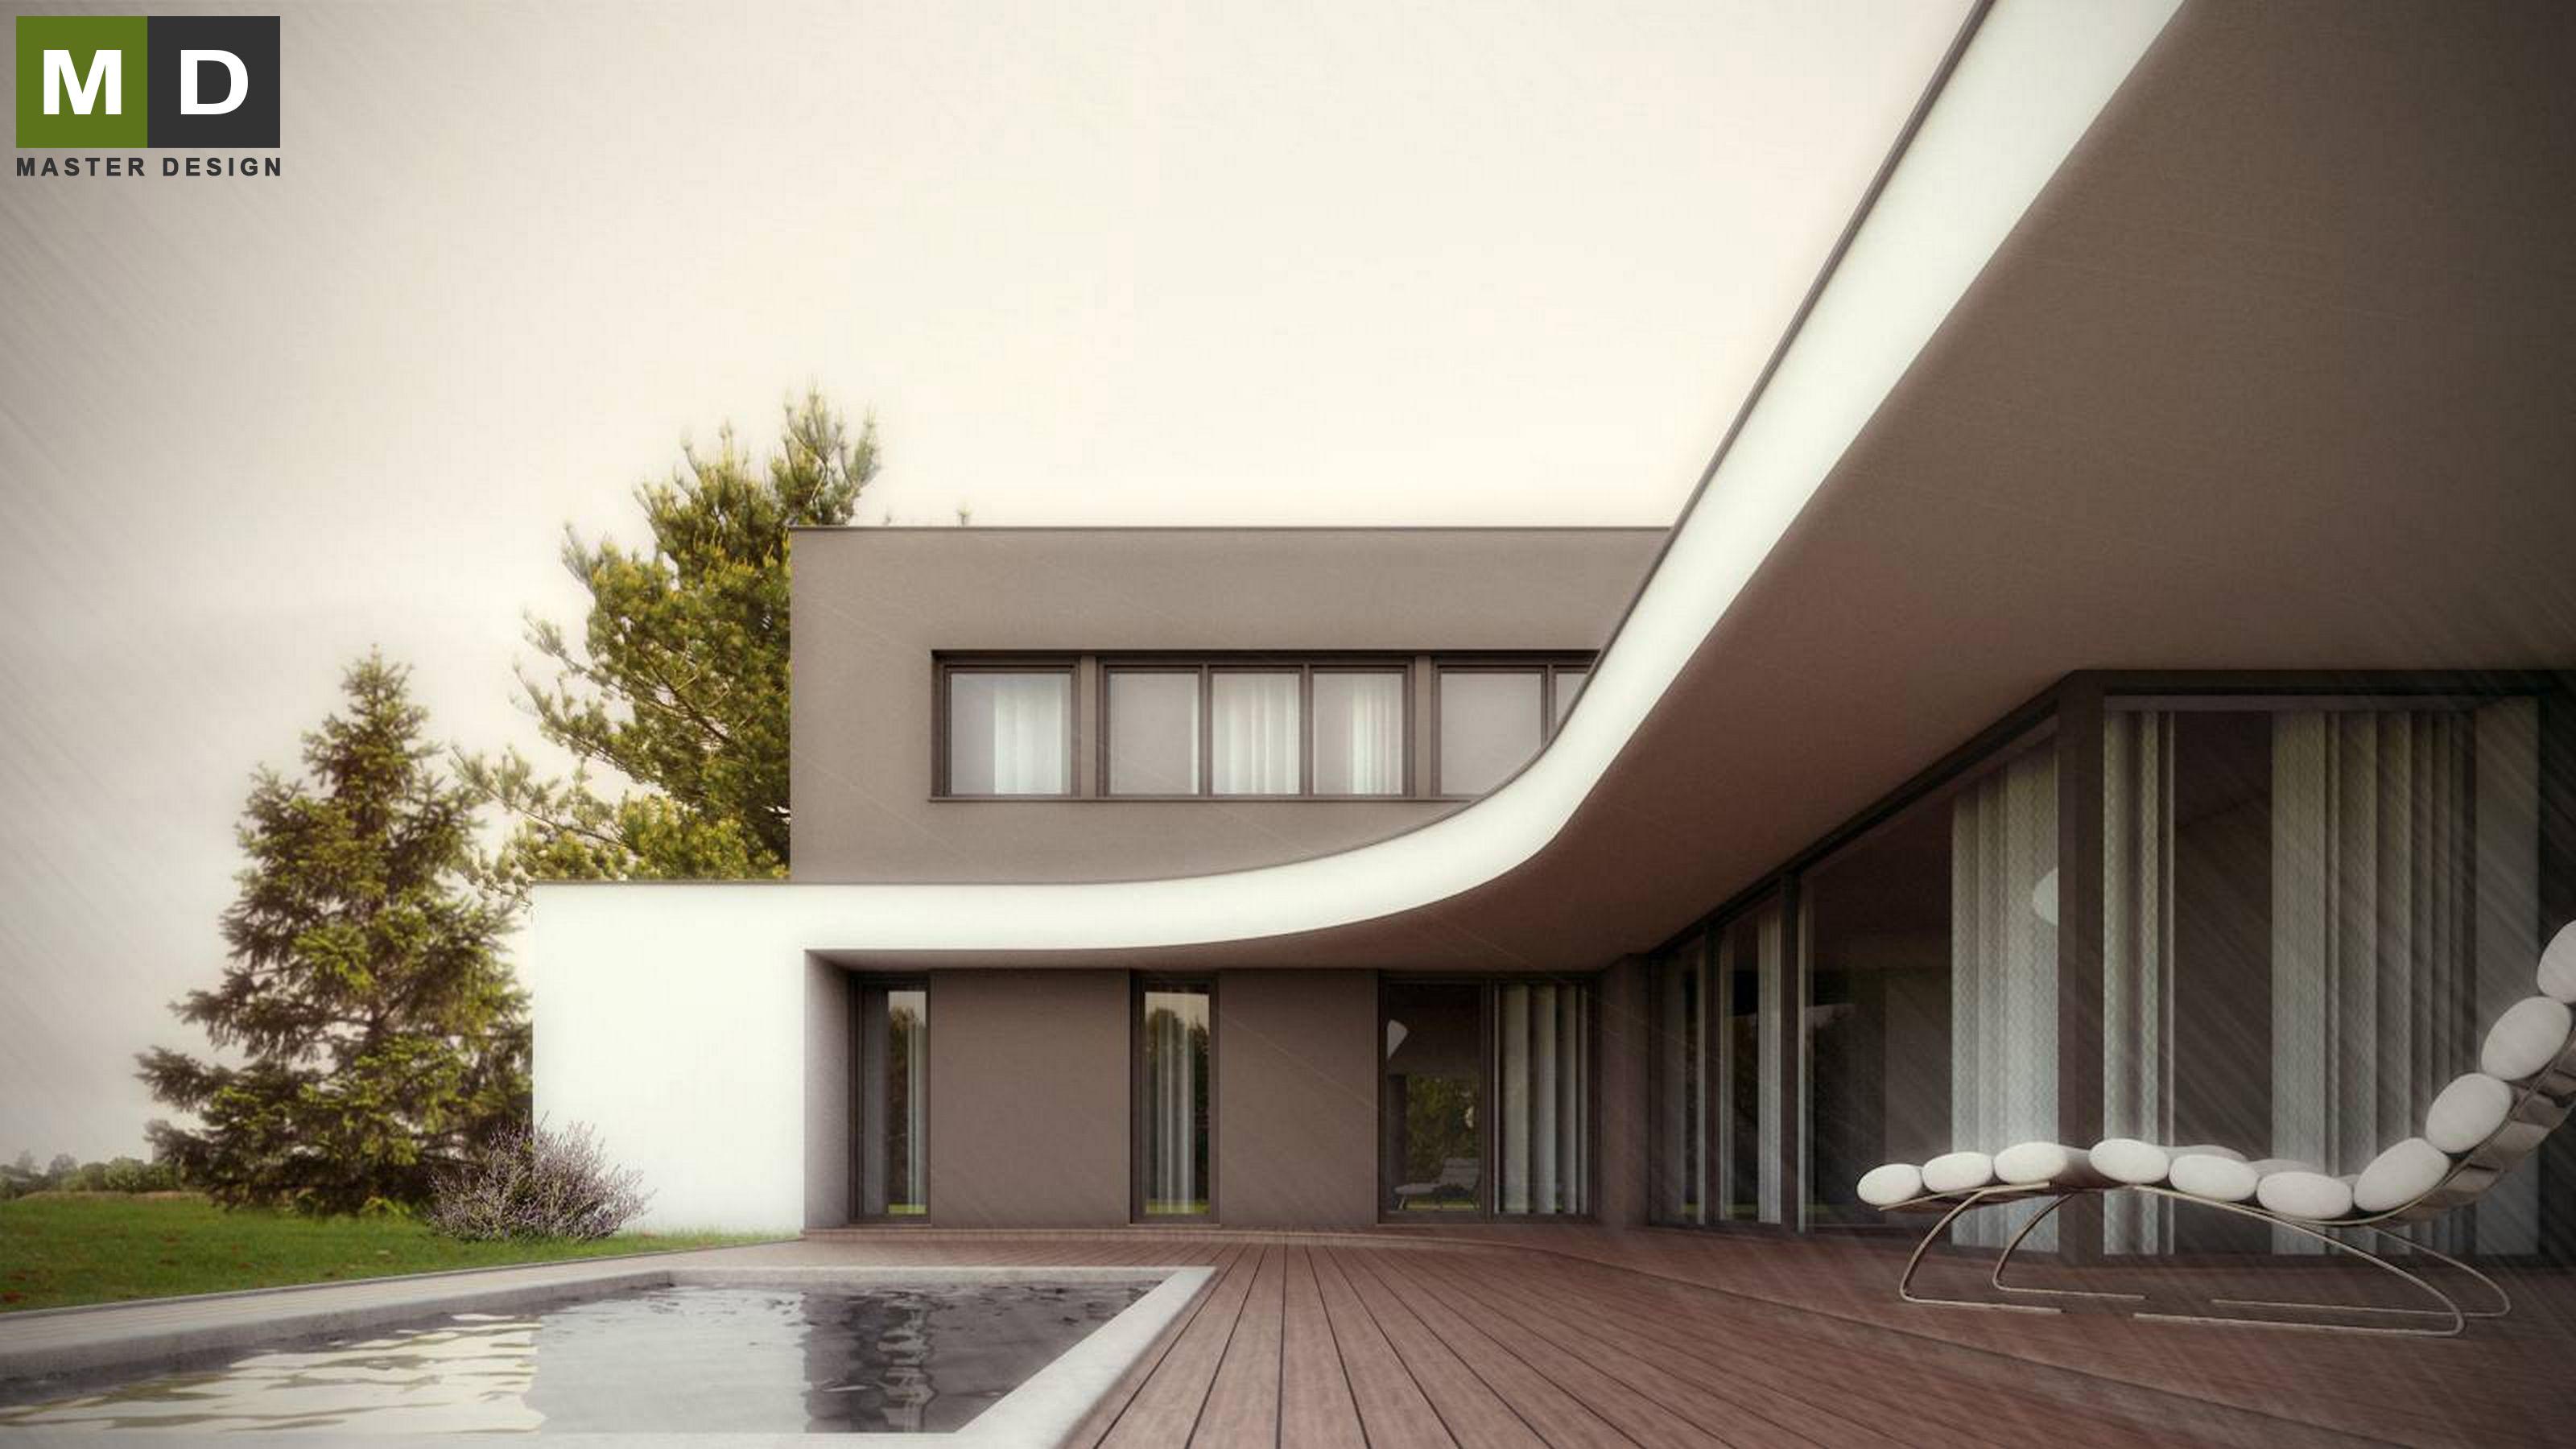 Superior Home Design Zlín Part - 2: Luxury Low-energy L-shaped House With A Green Roof - Zlín - Vizualizace ...